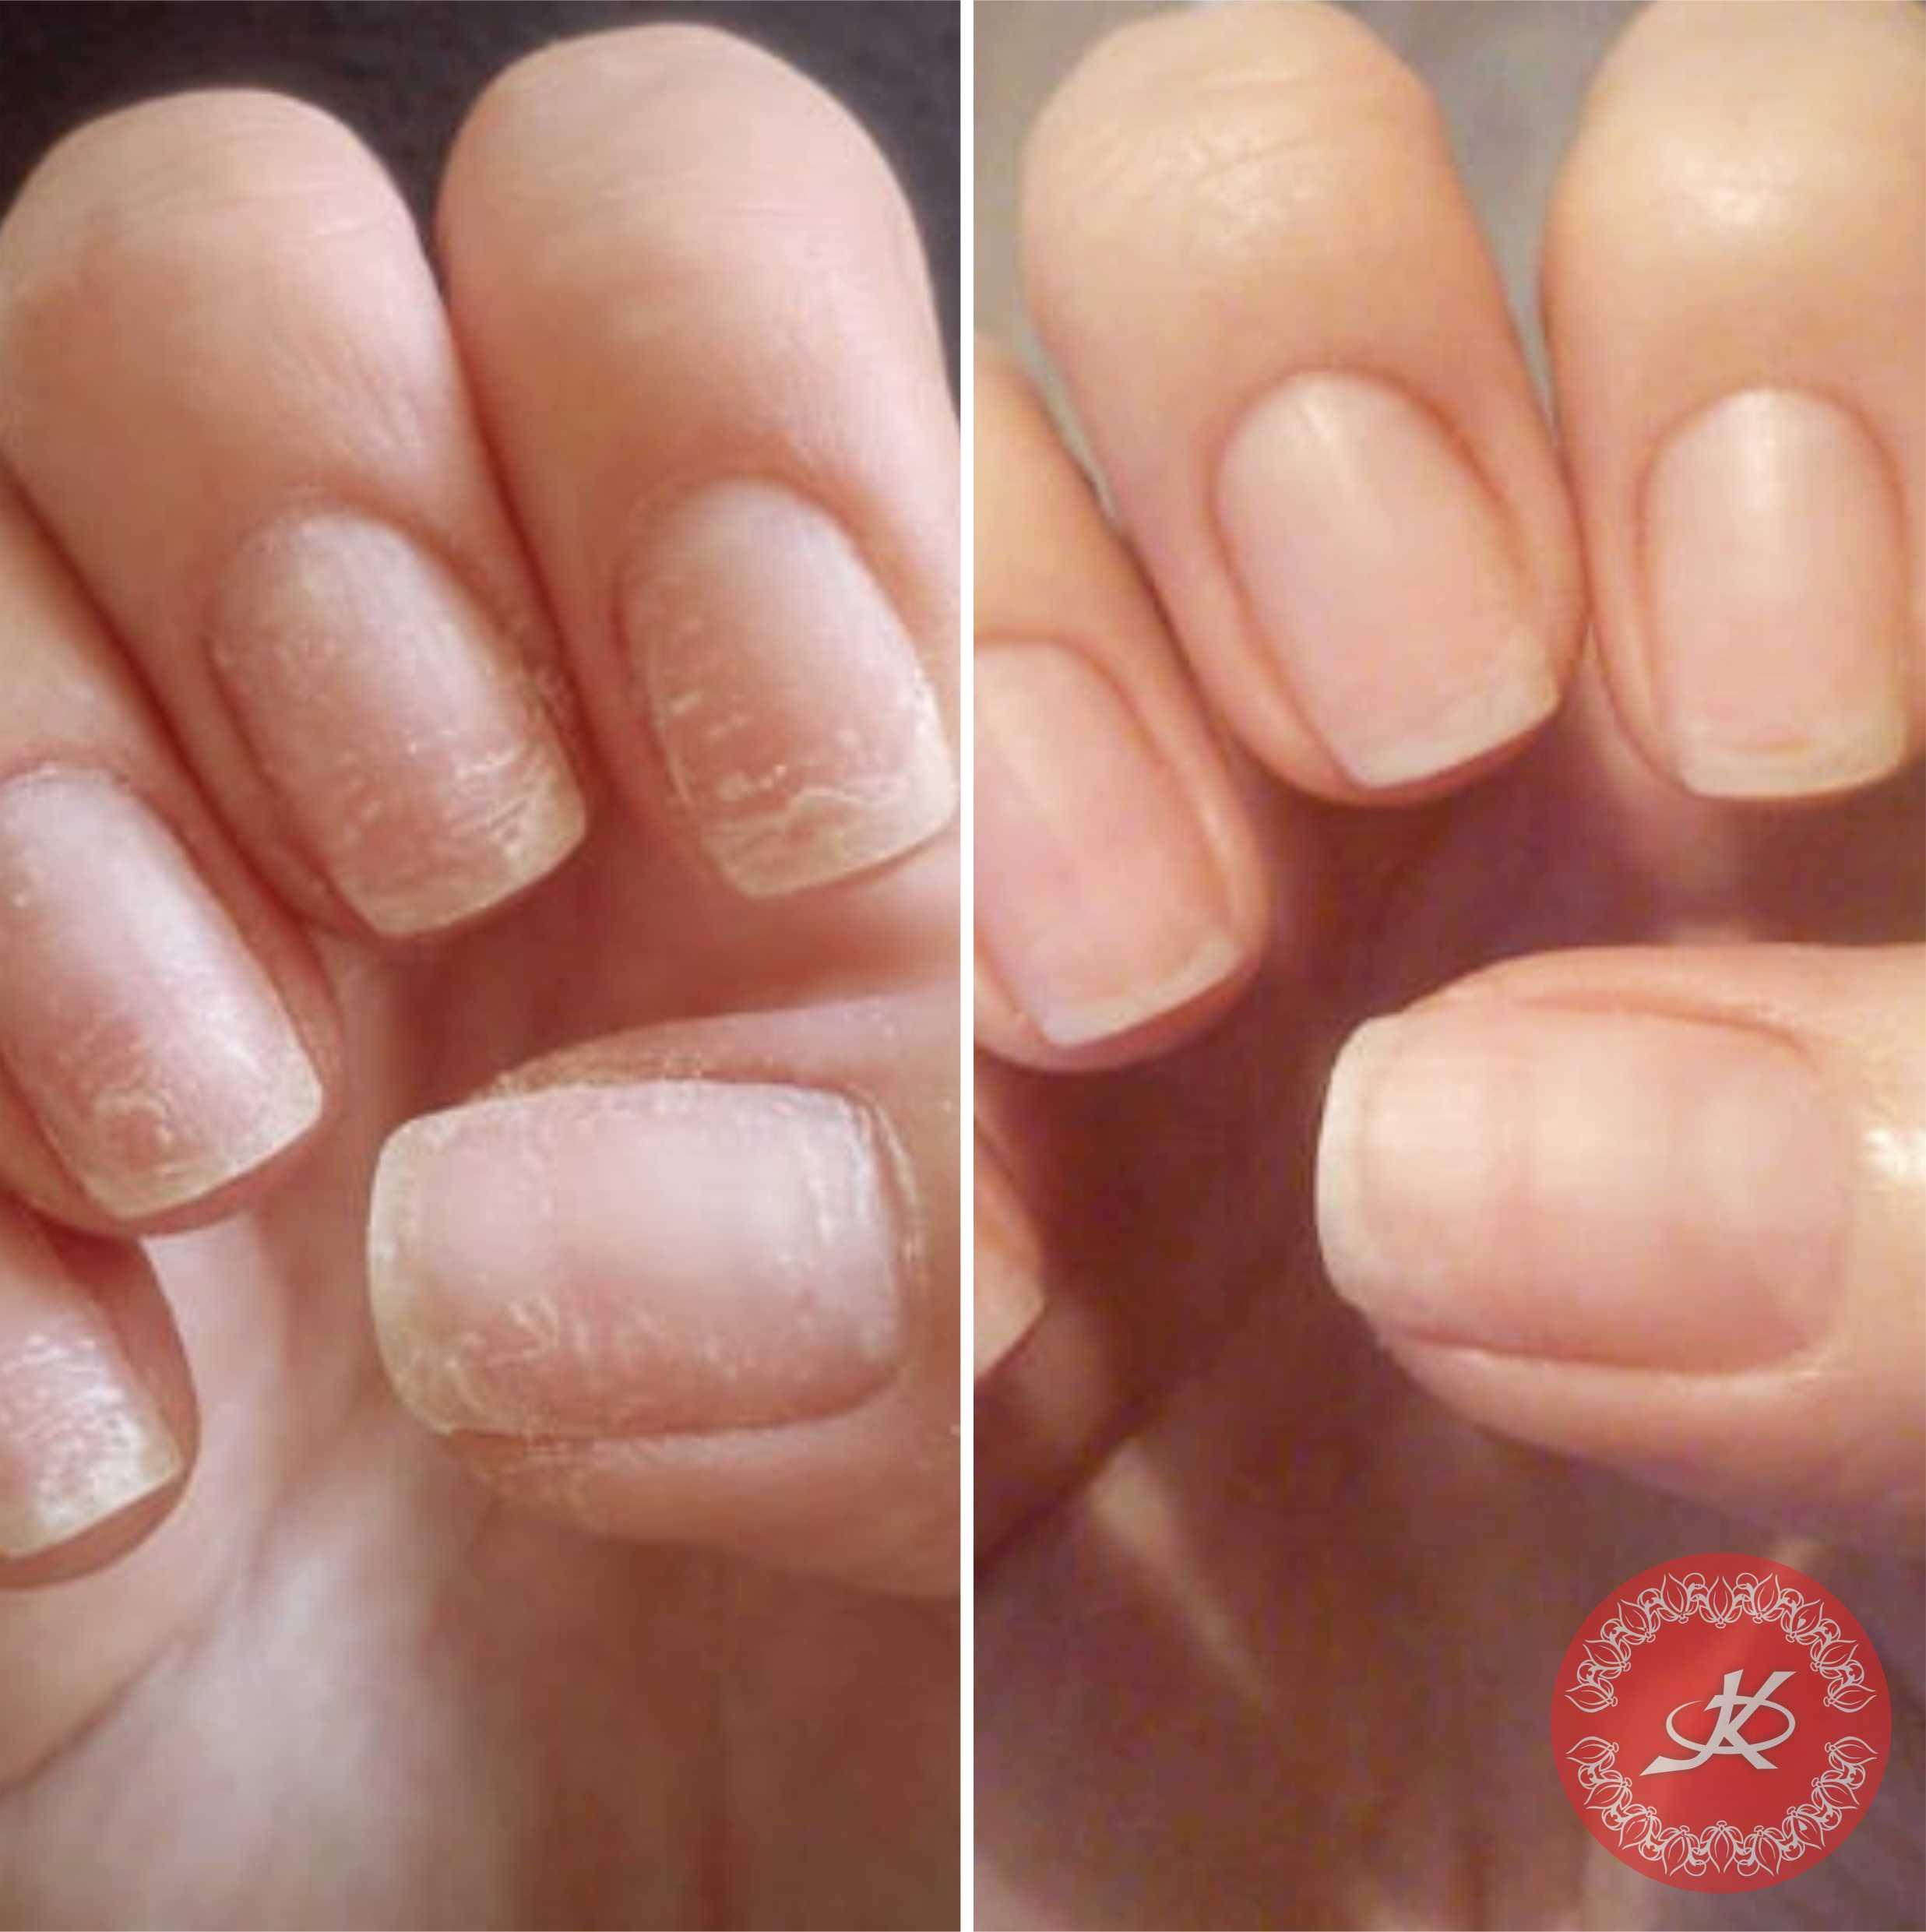 Чем лечить трещину на пальце руки у ногтя